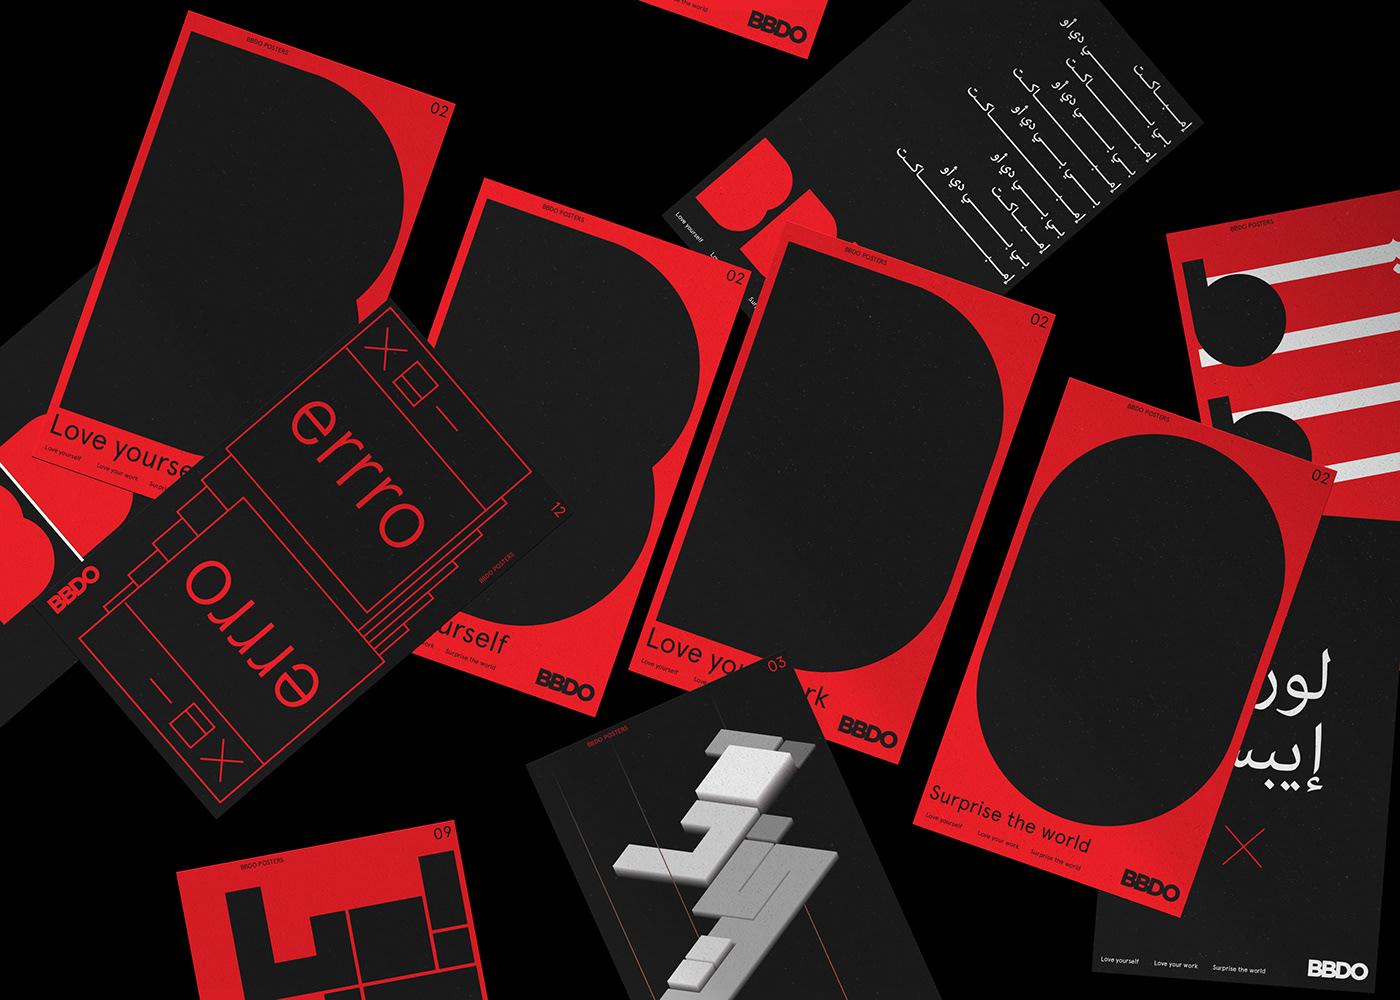 agency Arab arabic BBDO designstudio dubai geometric Isometric MENA poster